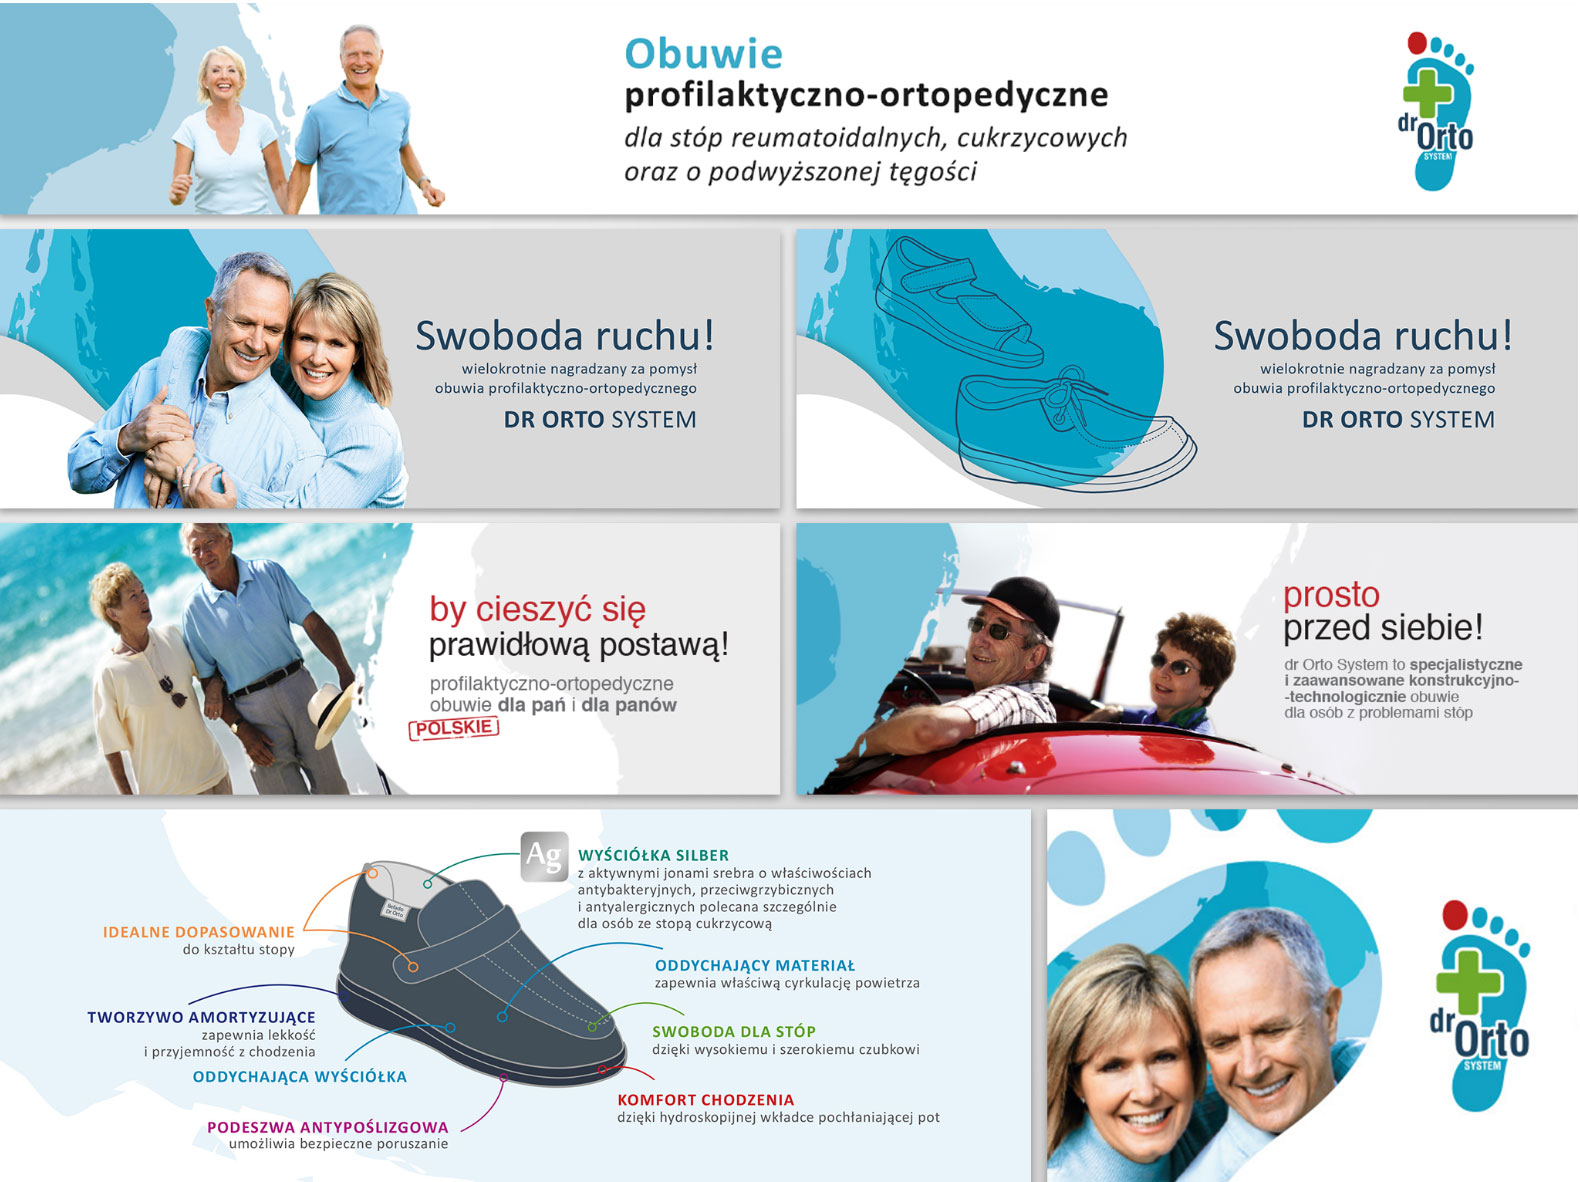 Banerki internetowe dr Orto